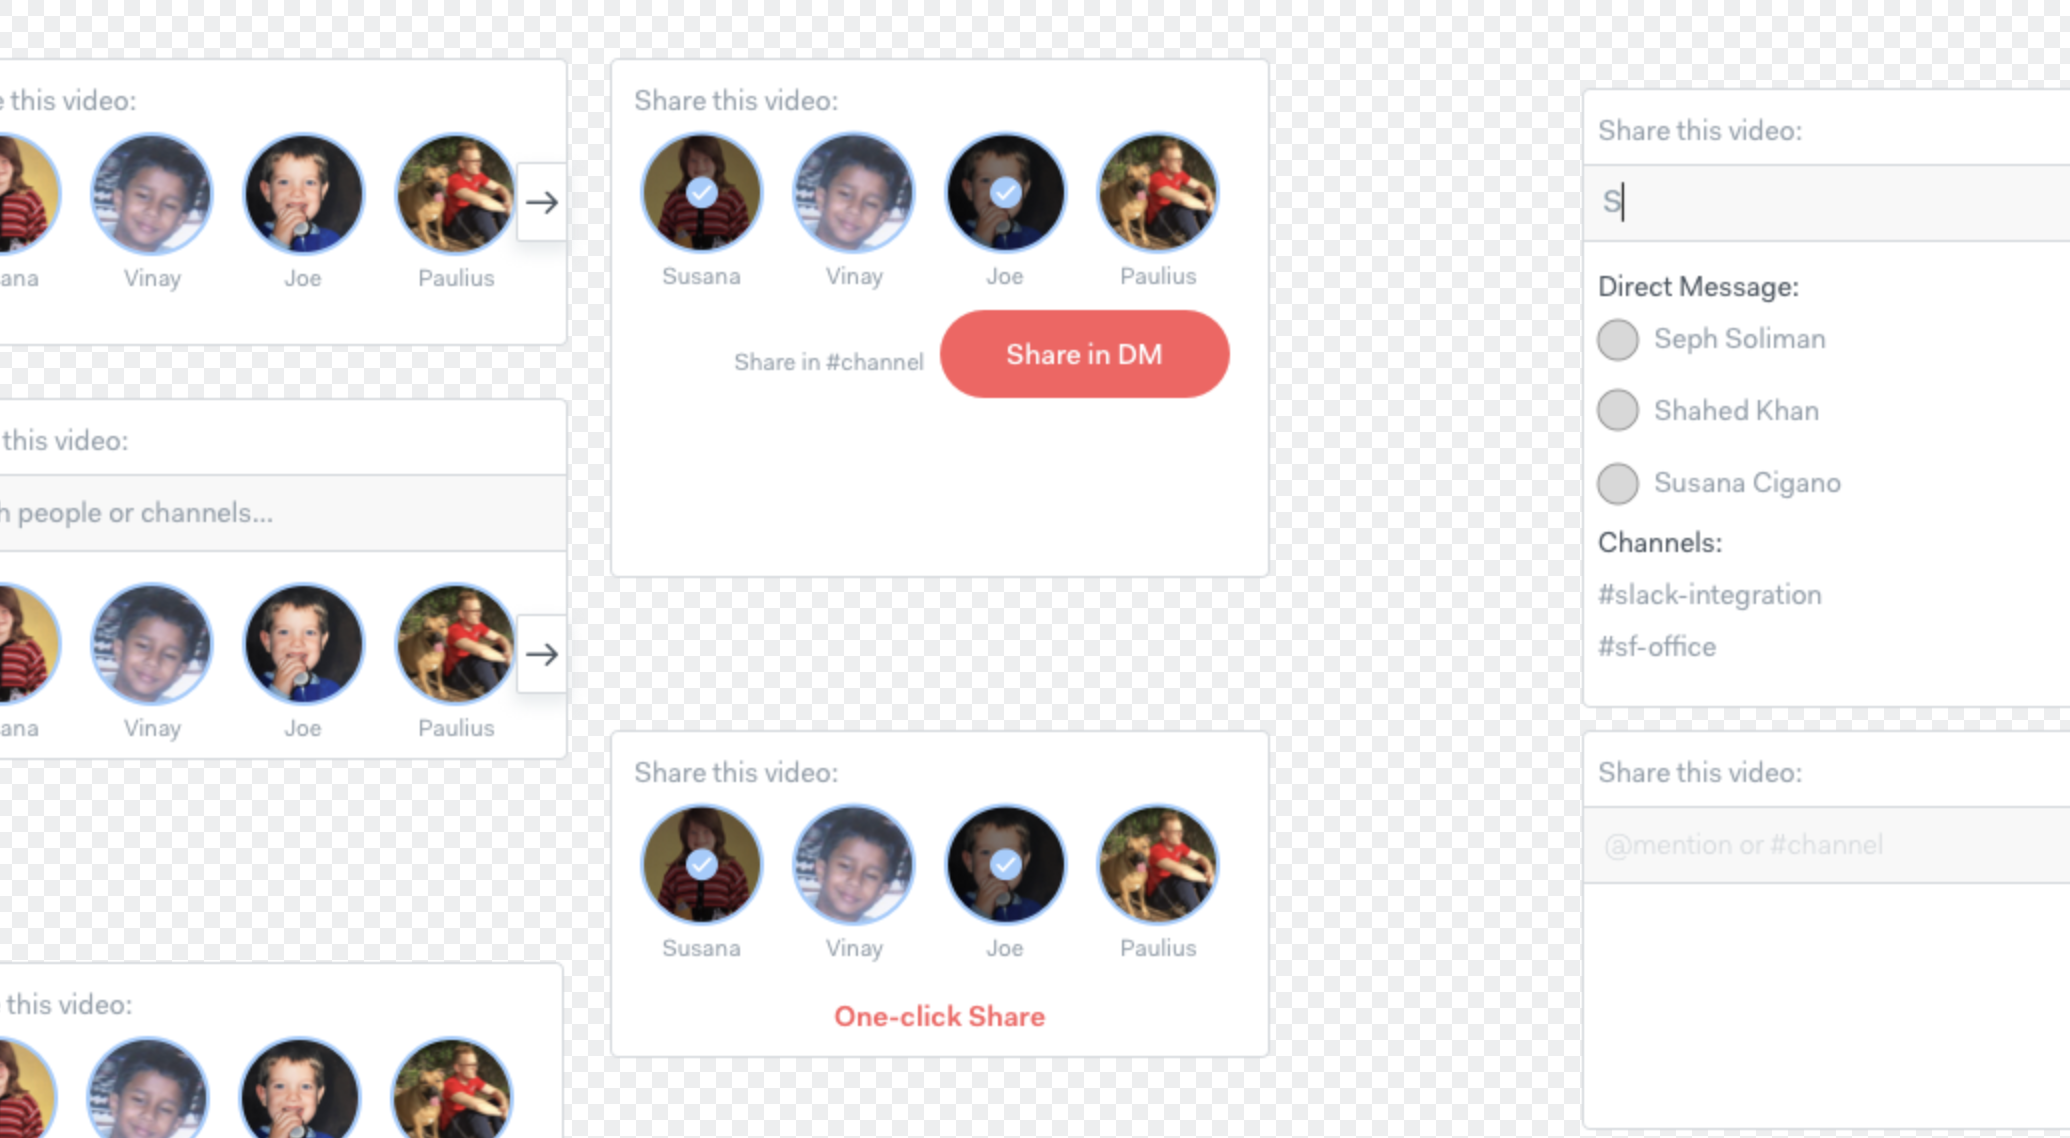 Video sharing screenshot